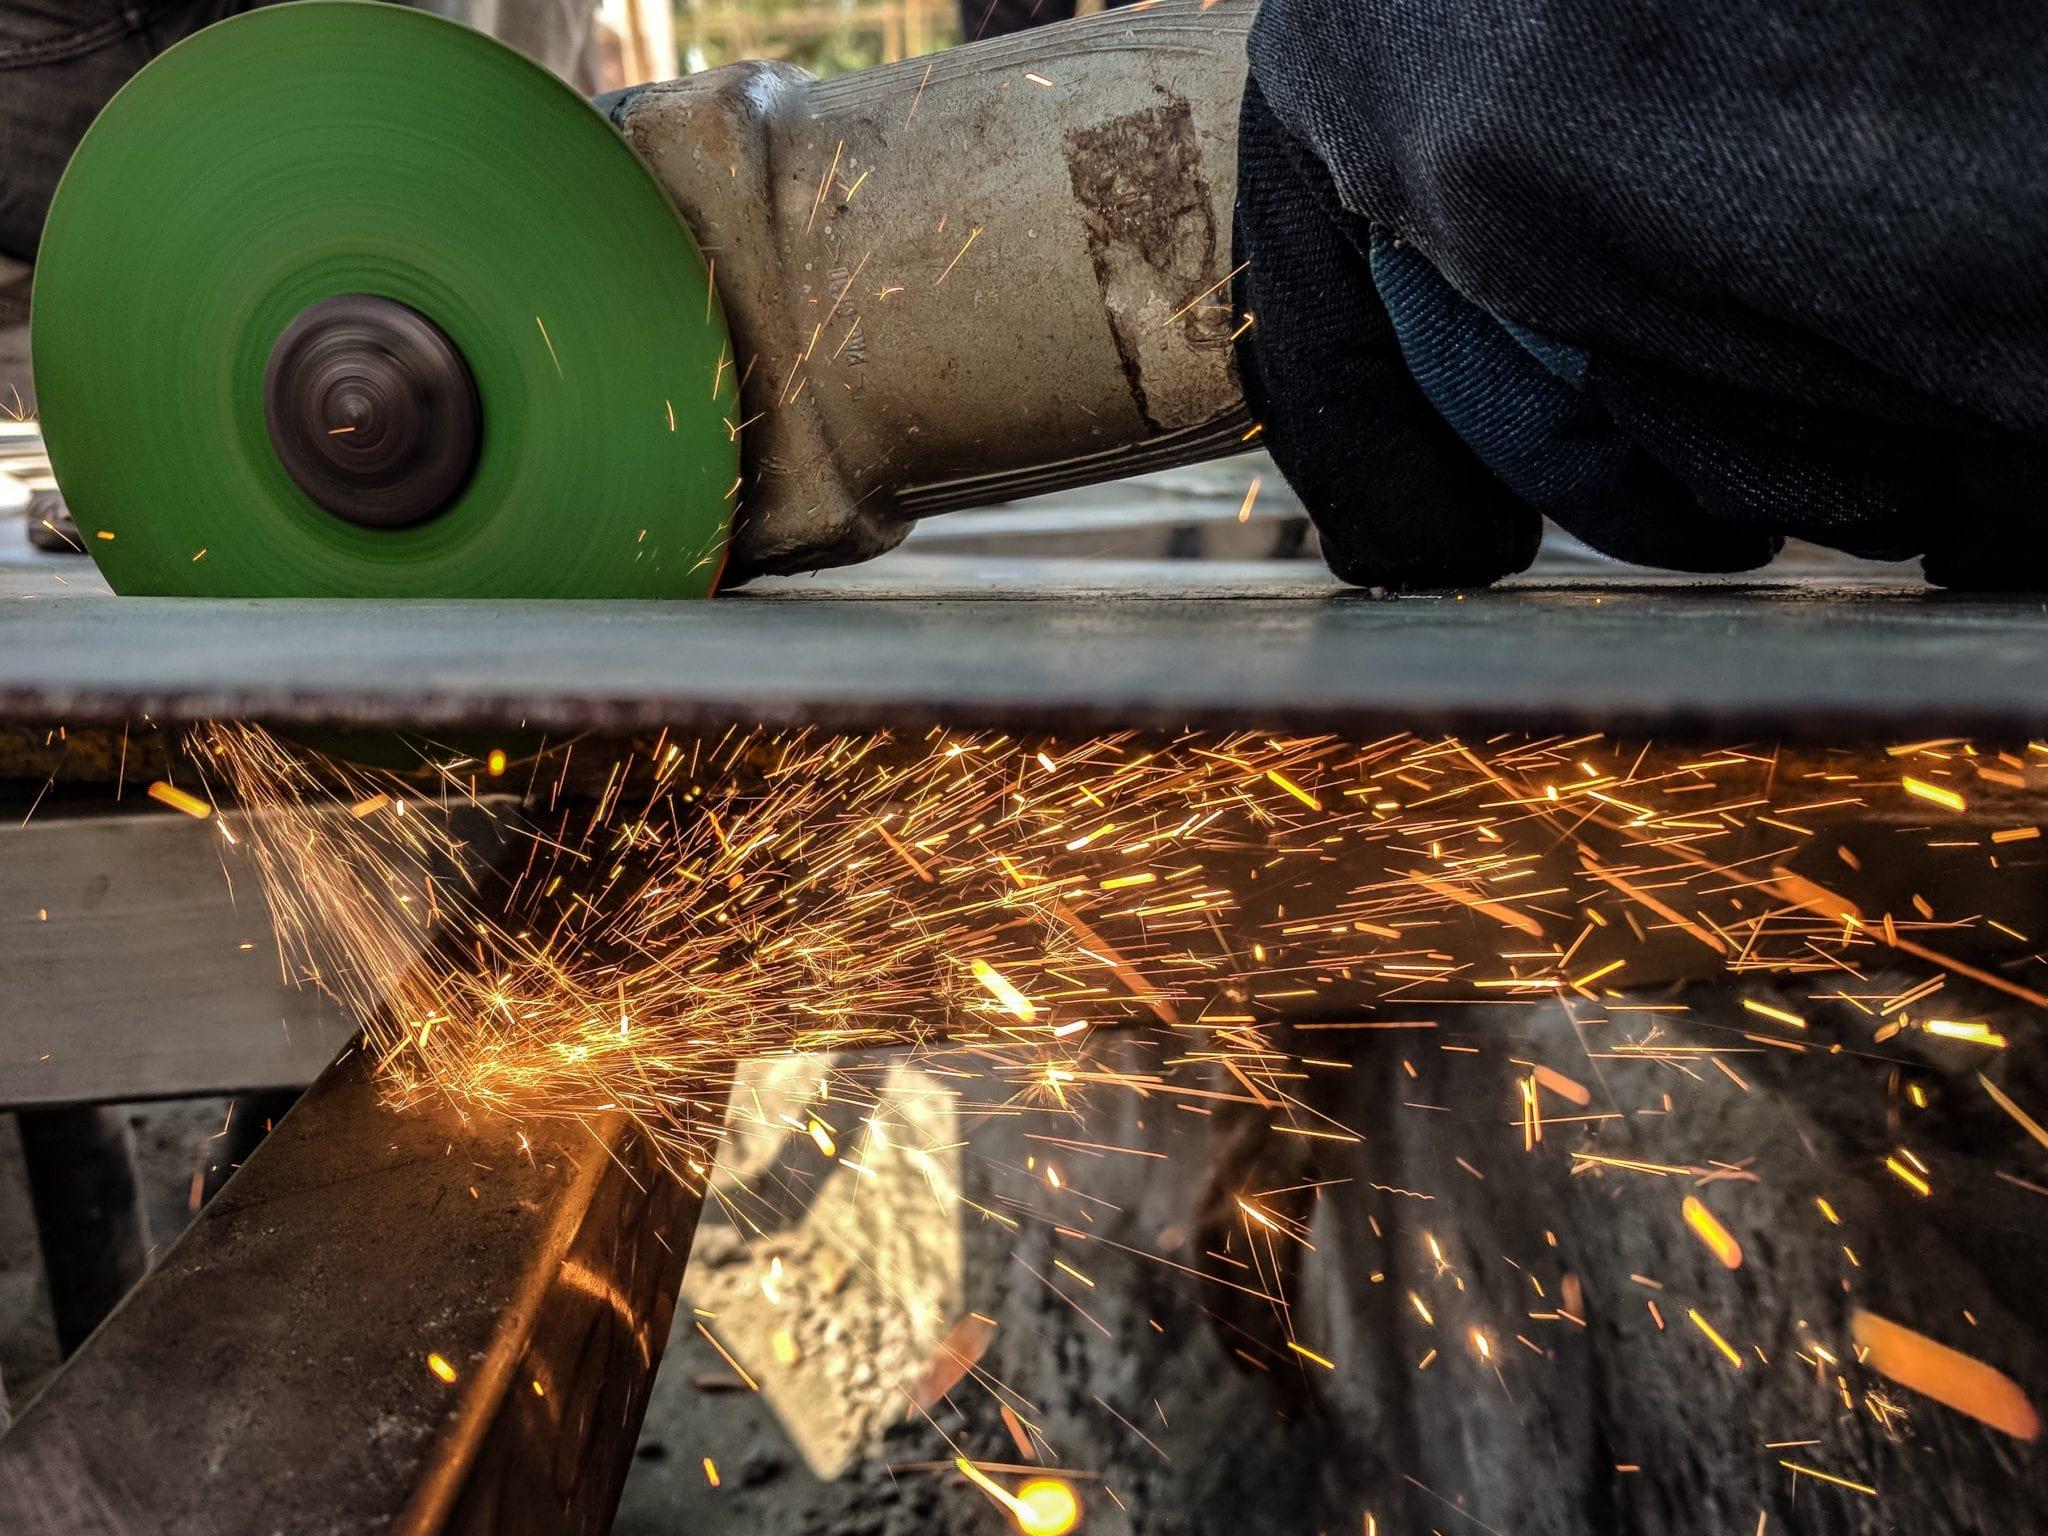 construction-grinder-industry-977526